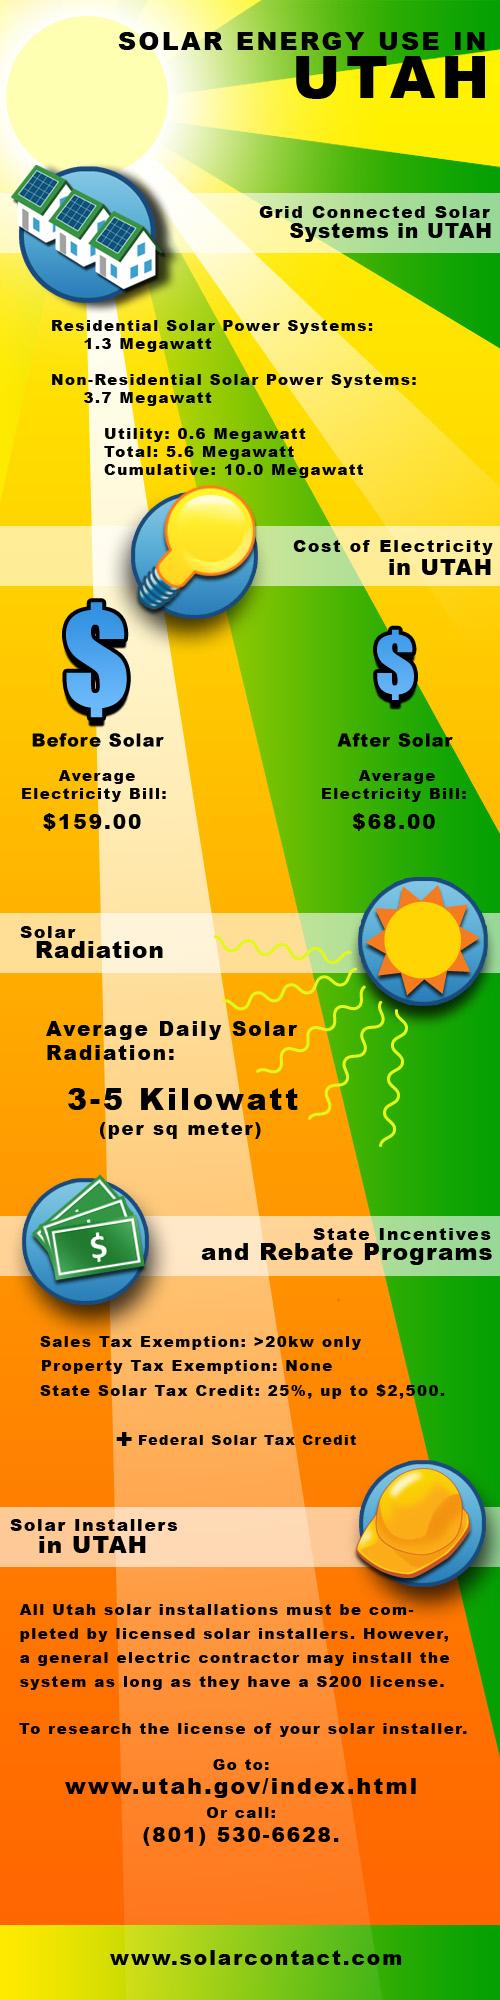 Fact Sheet Solar Energy Use in Utah